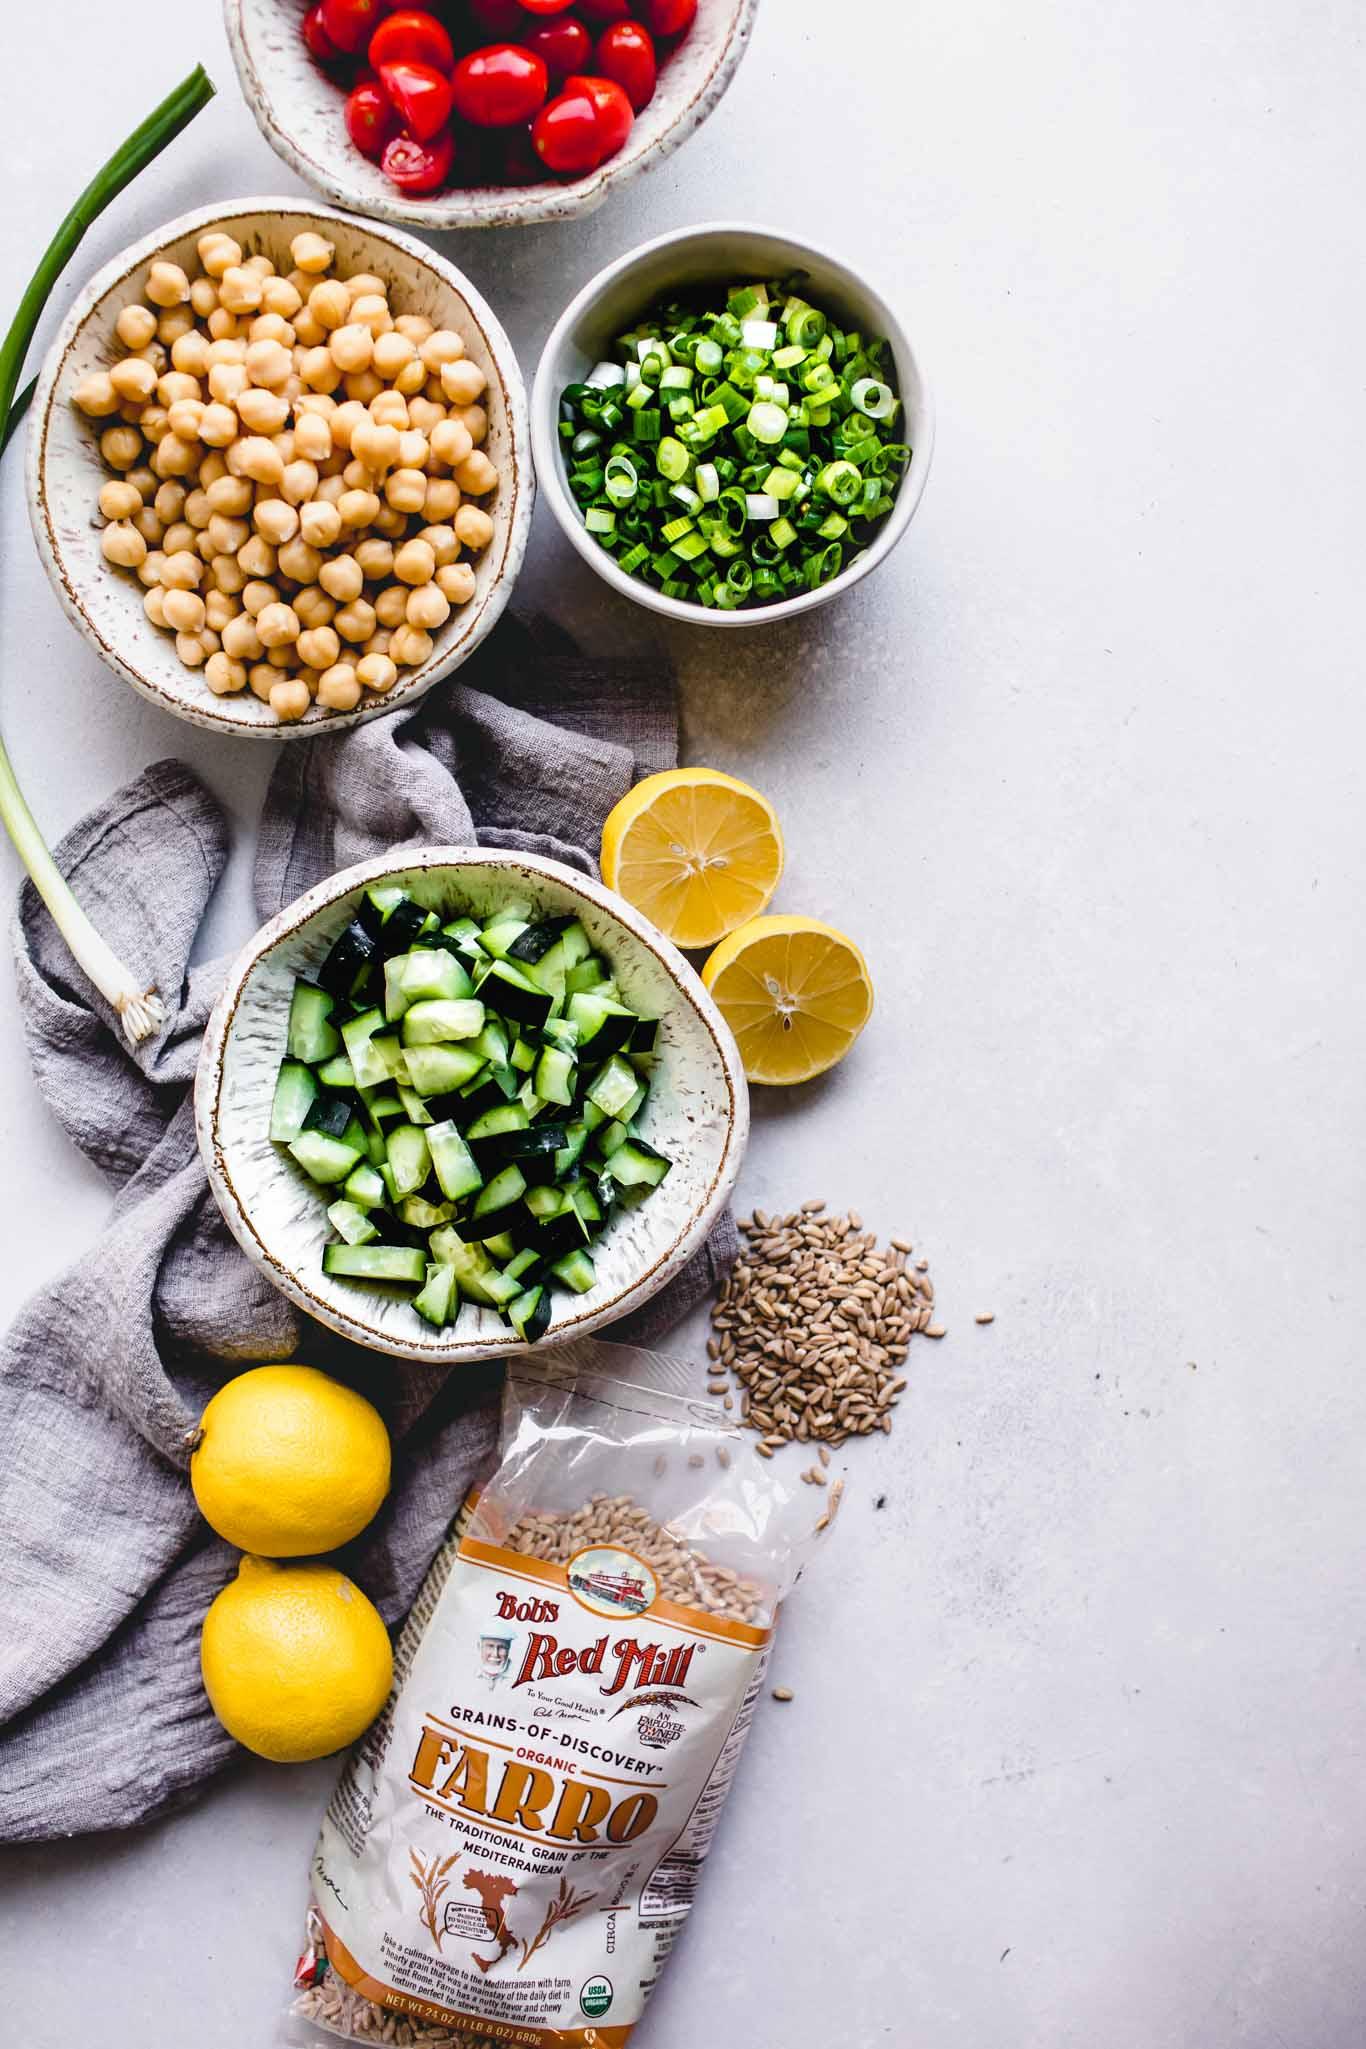 Ingredients for farro salad.